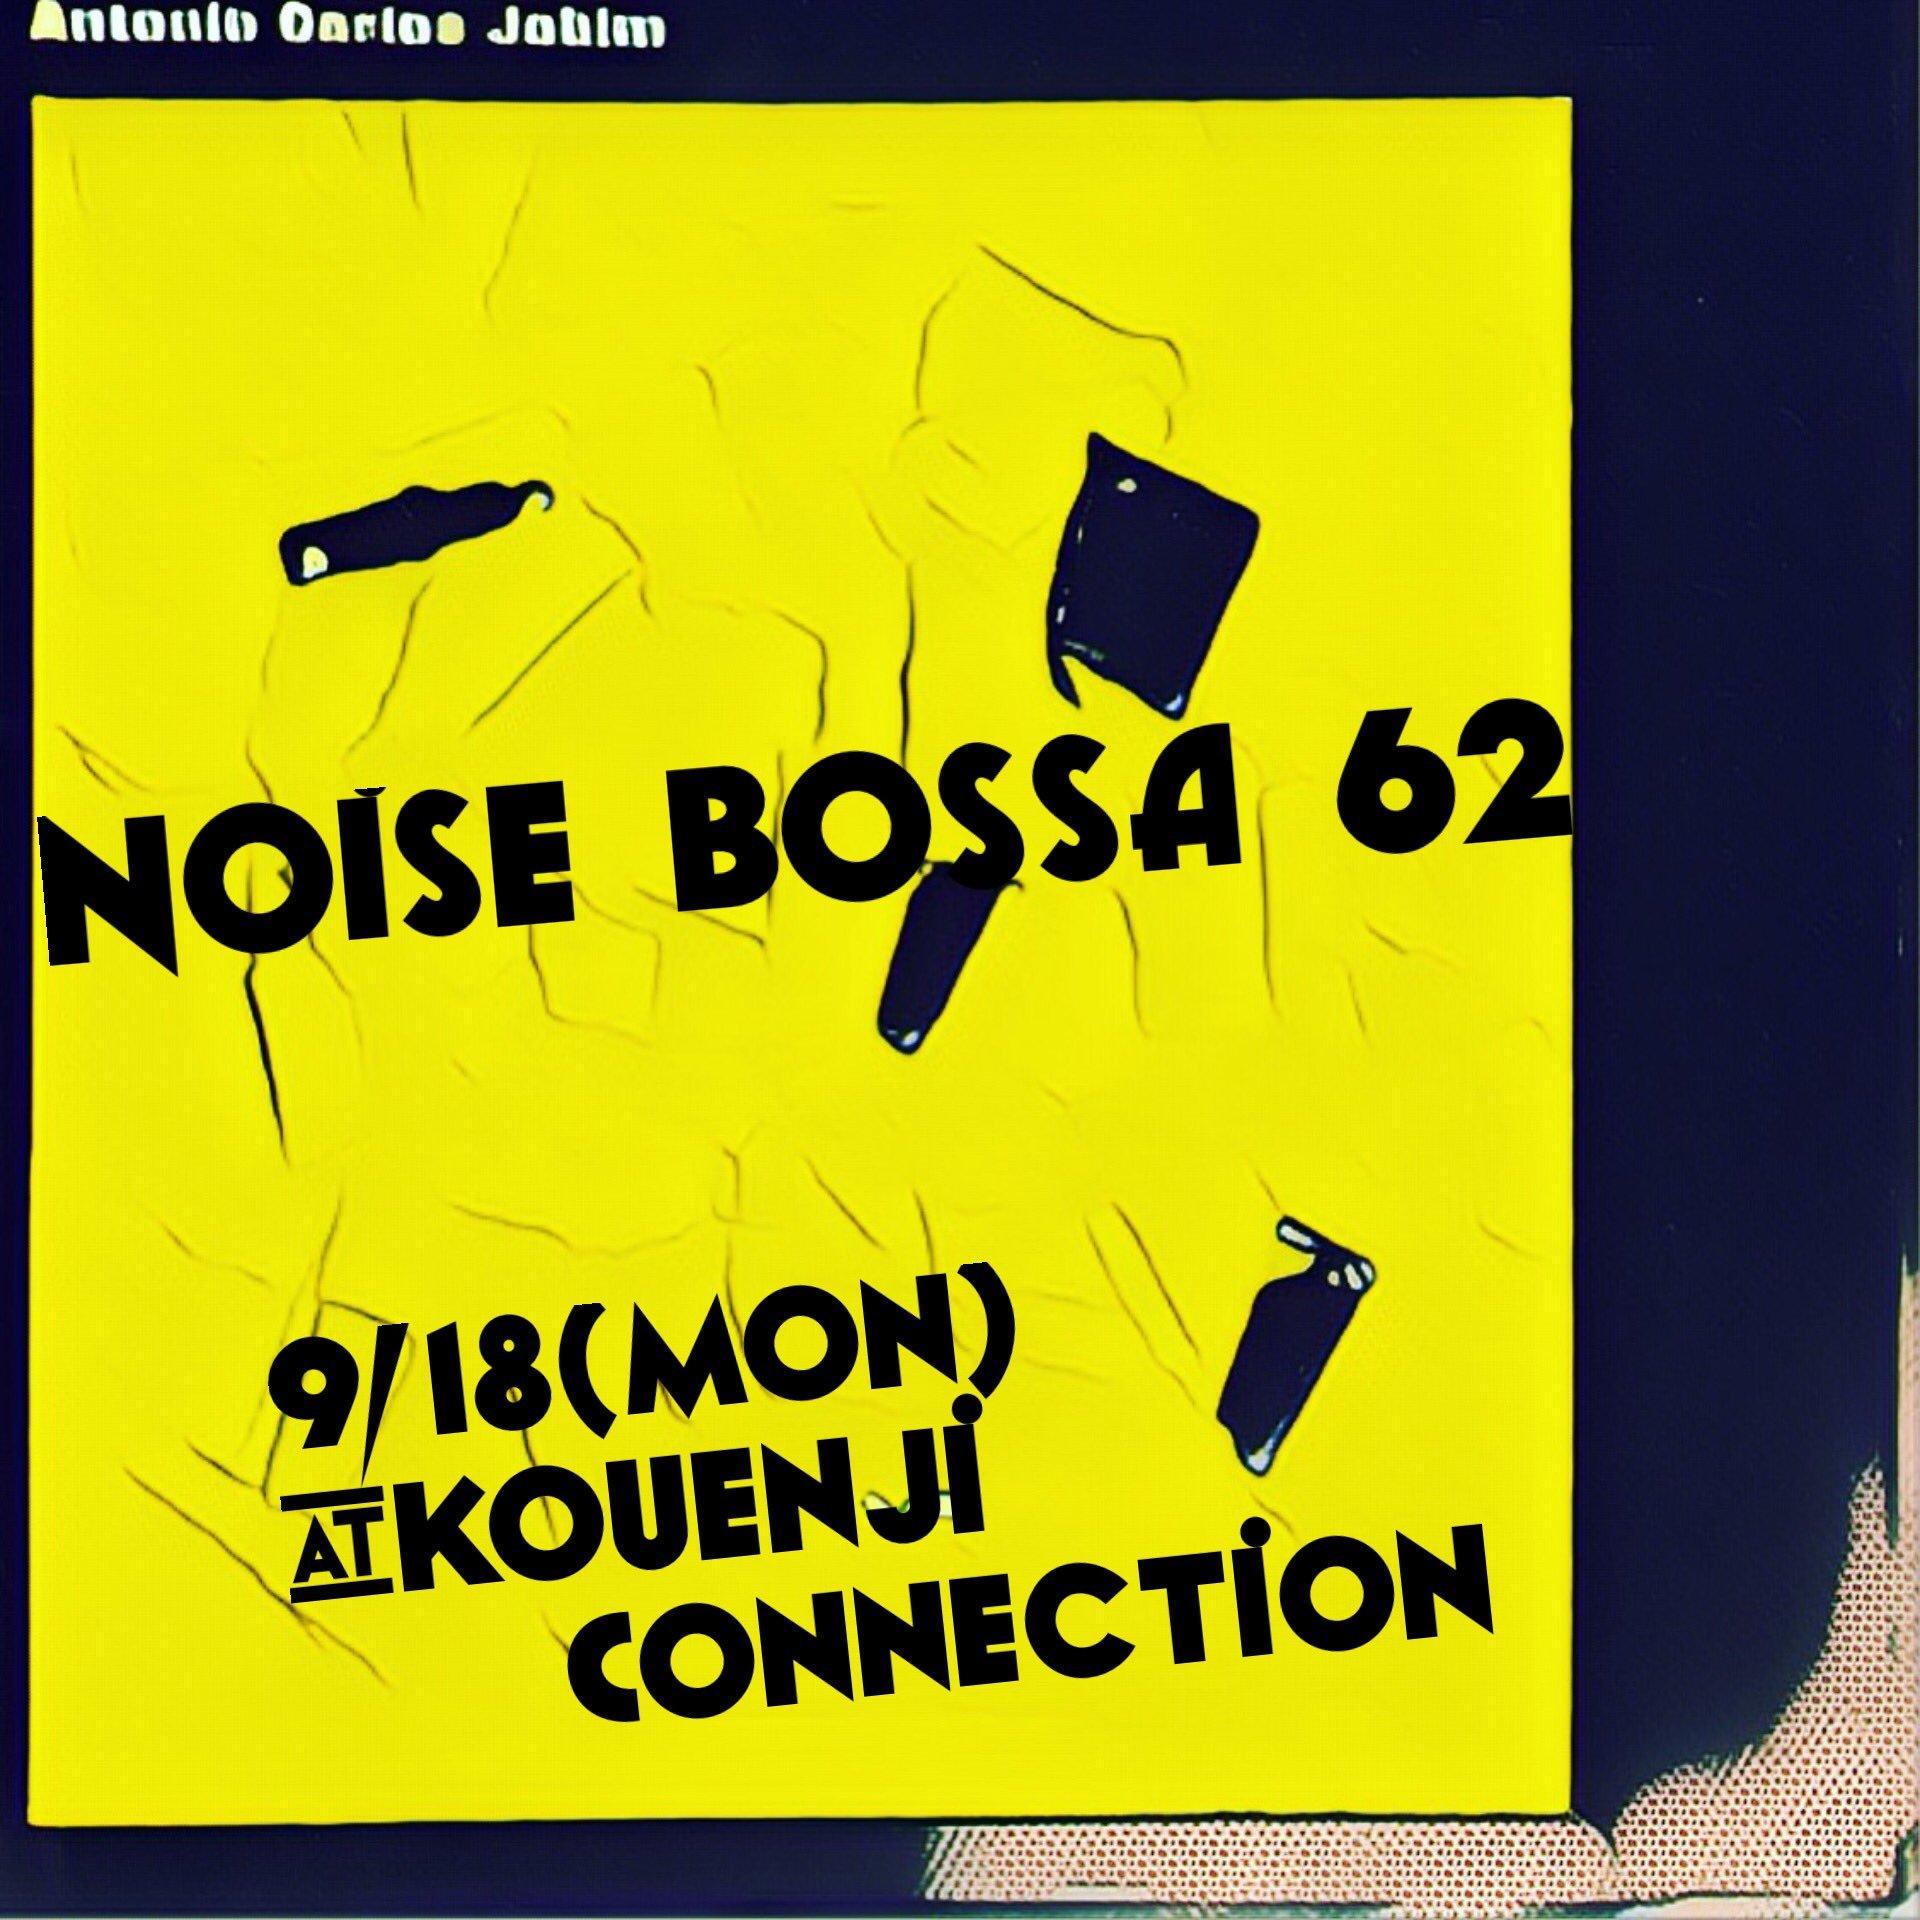 09/18(月・祝)横田寛之 ETHNIC MINORITY「Noise Bossa Vol.62」_c0099300_15503935.jpg